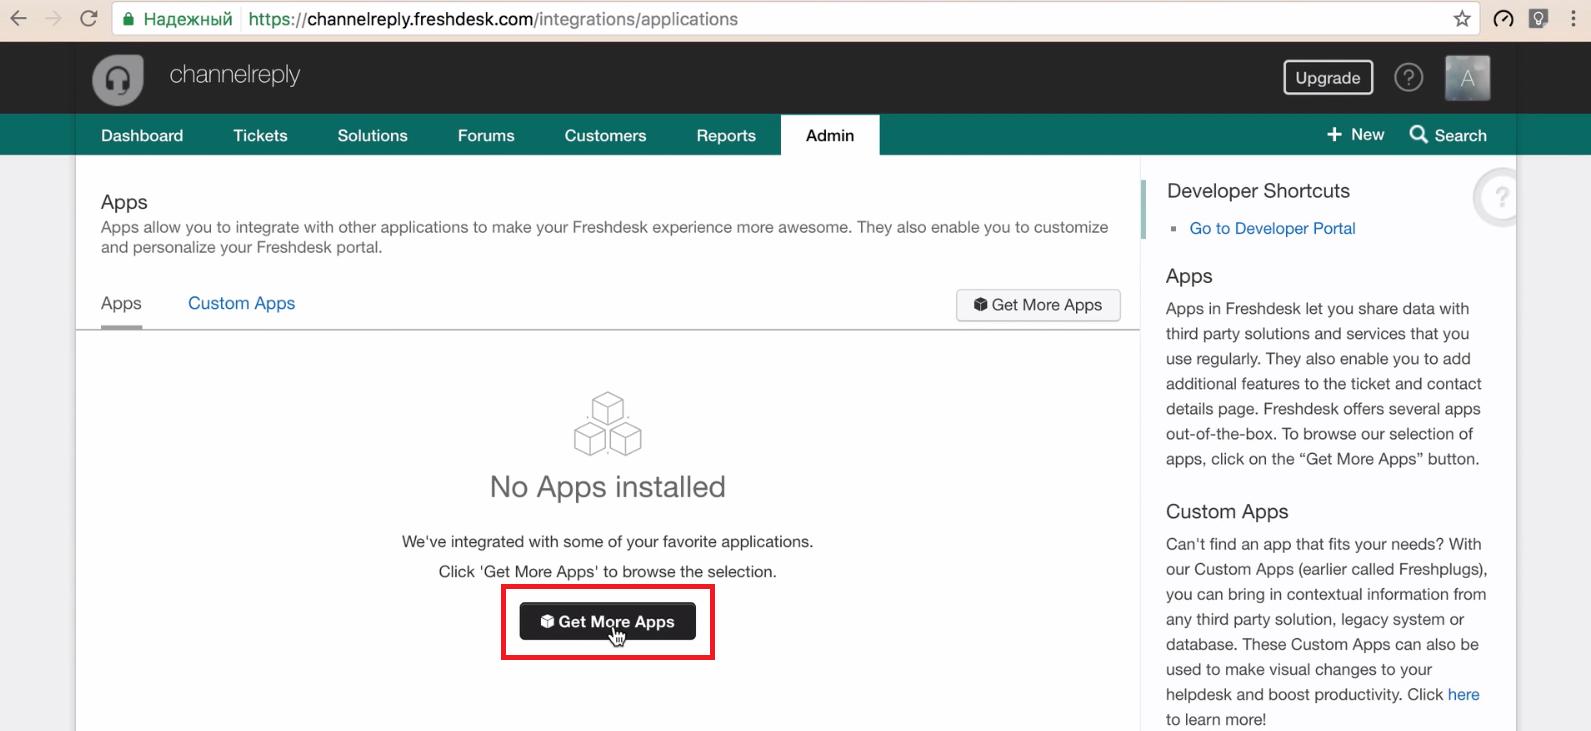 Get More Apps in Freshdesk